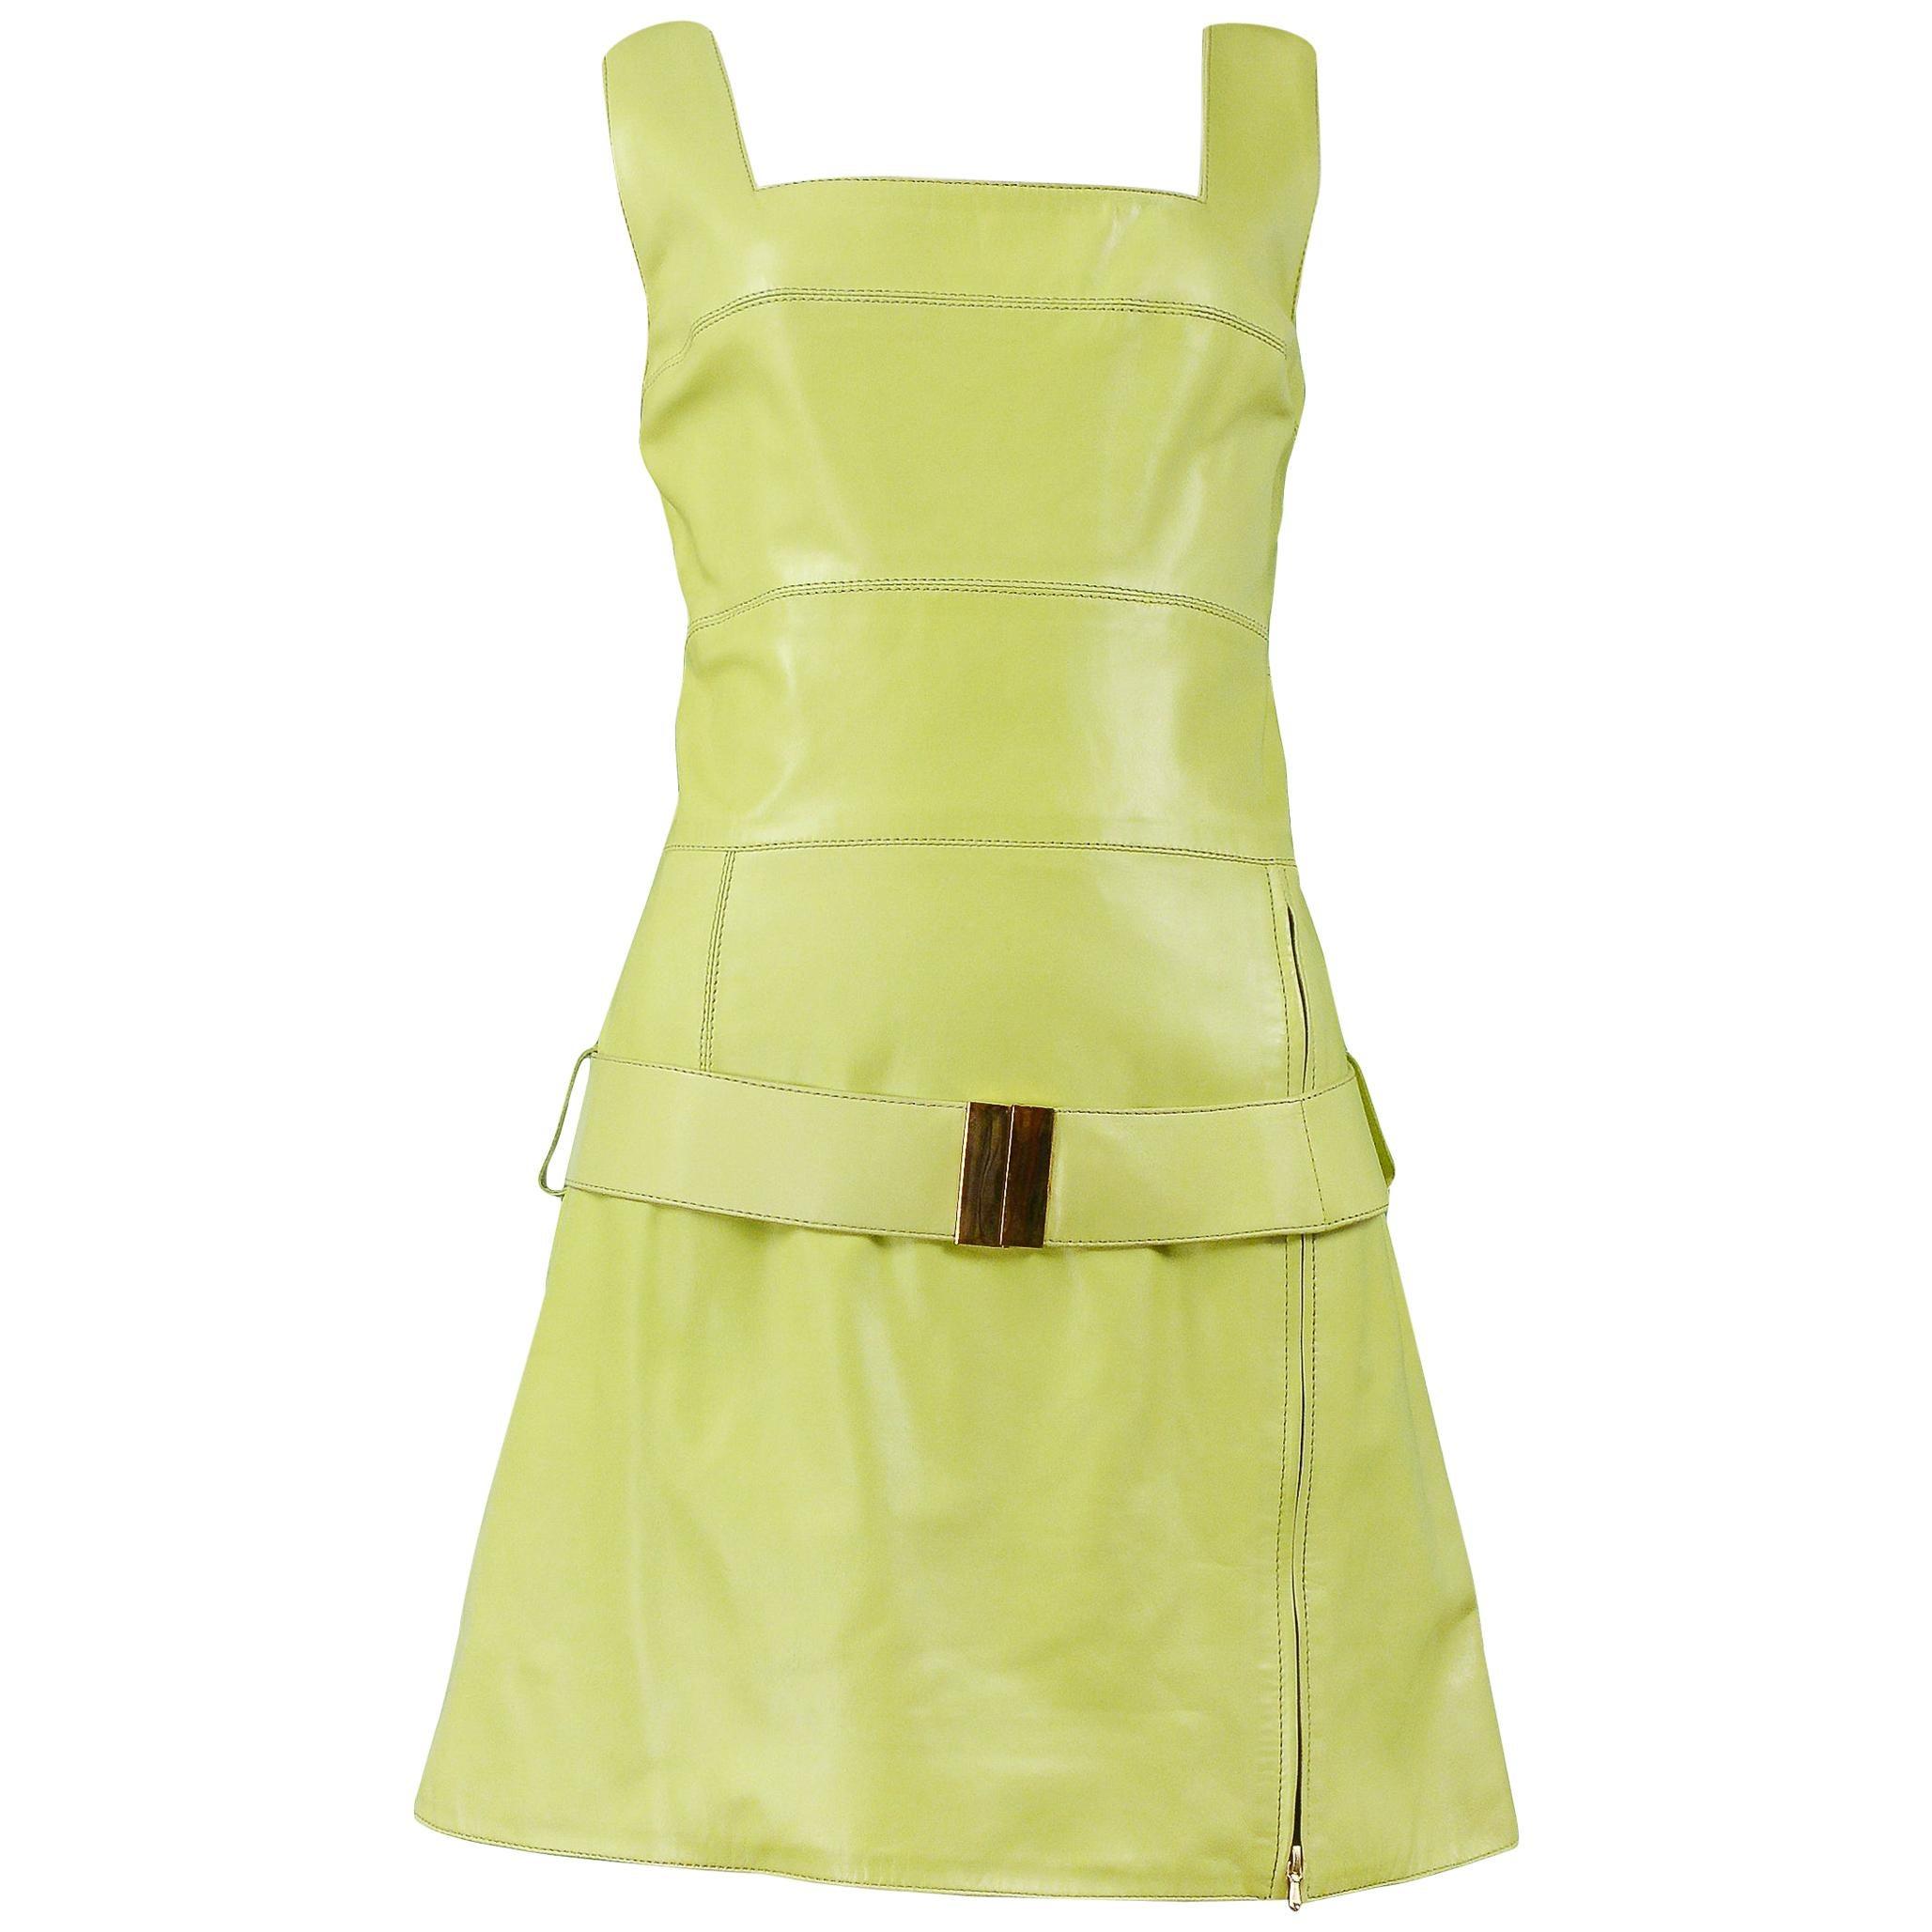 Vintage Claude Montana Chartreuse Green Leather Dress & Belt